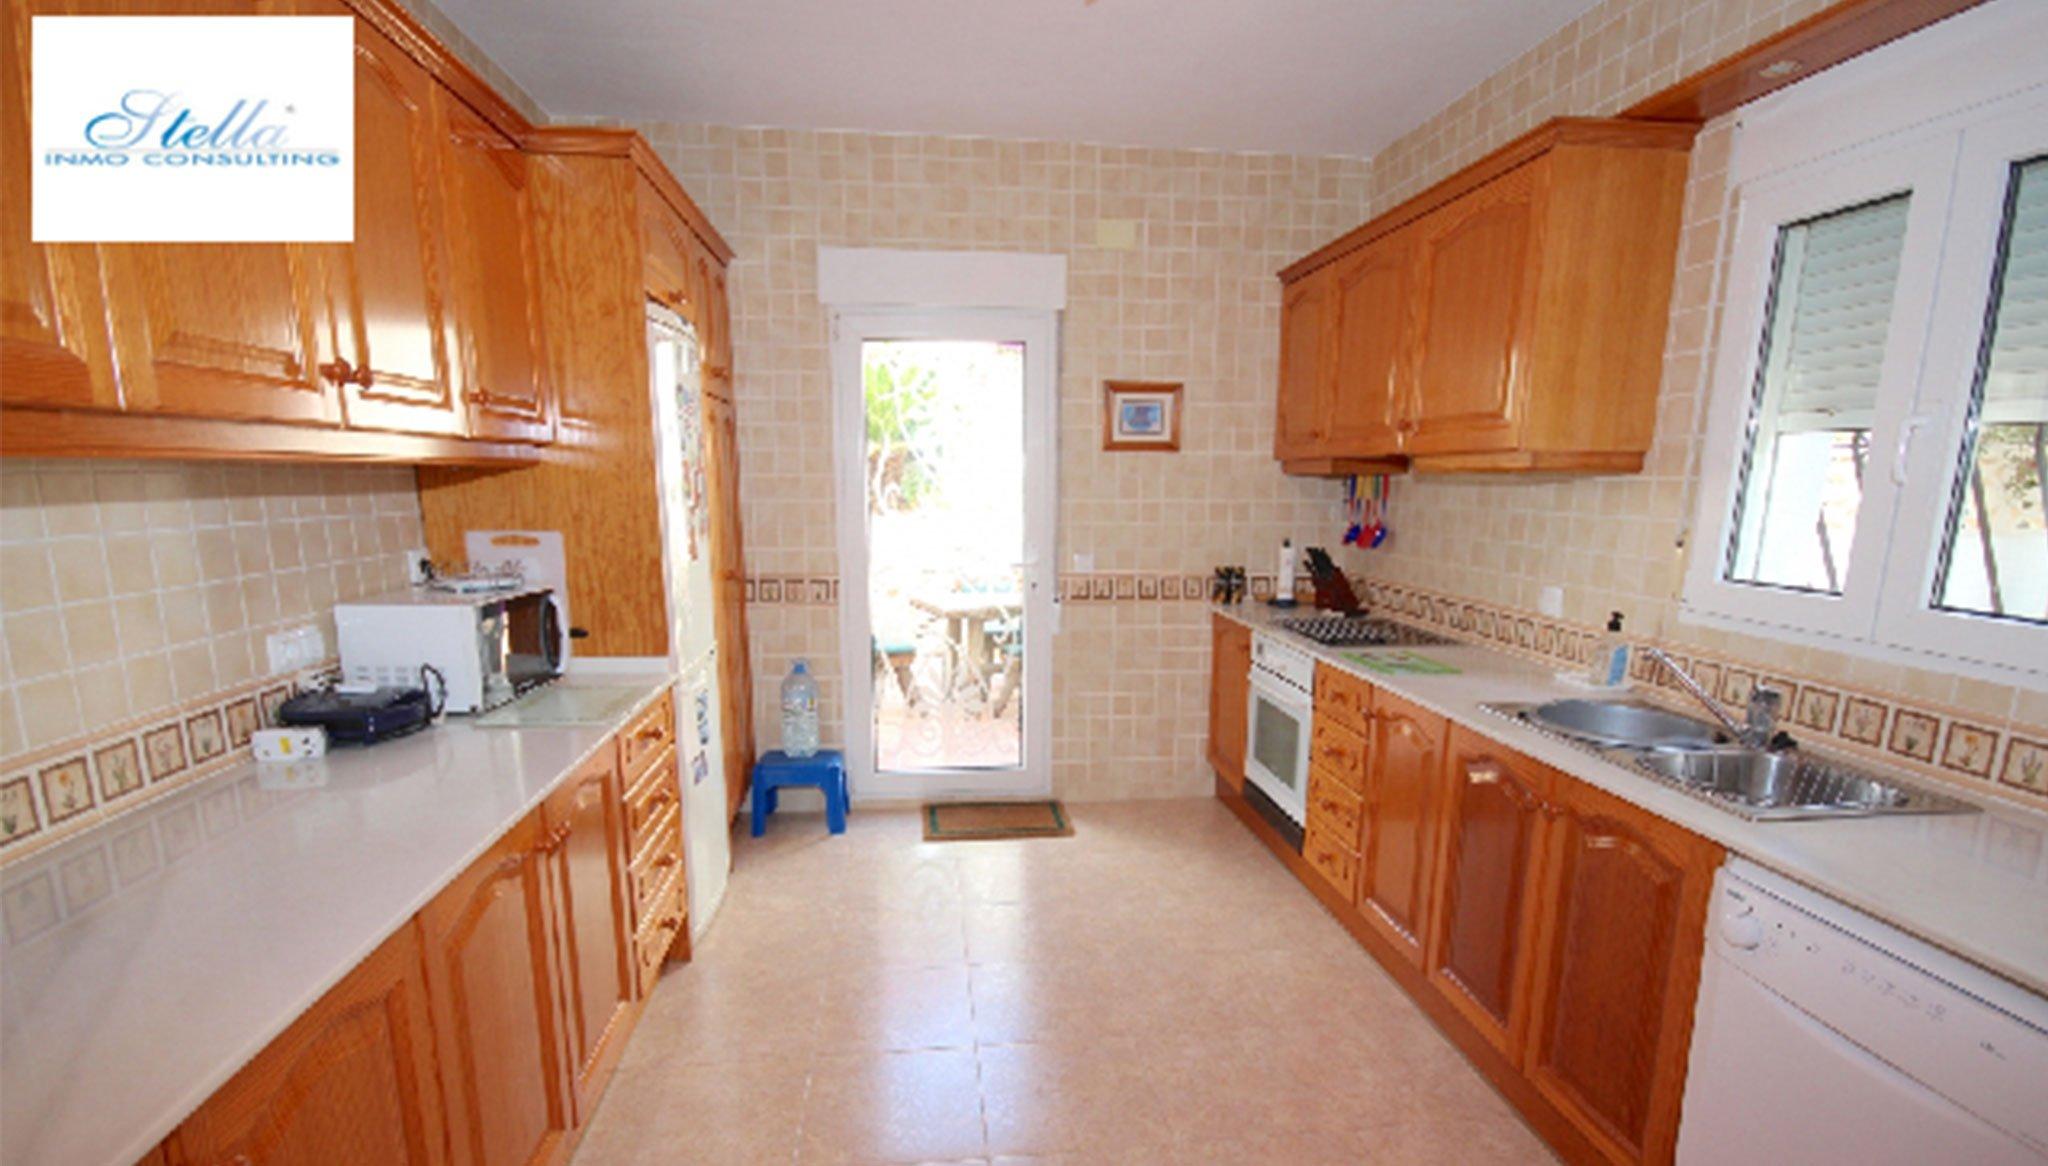 Cucina in villa in vendita a Monte Pedreguer - Stella Inmo Consulting